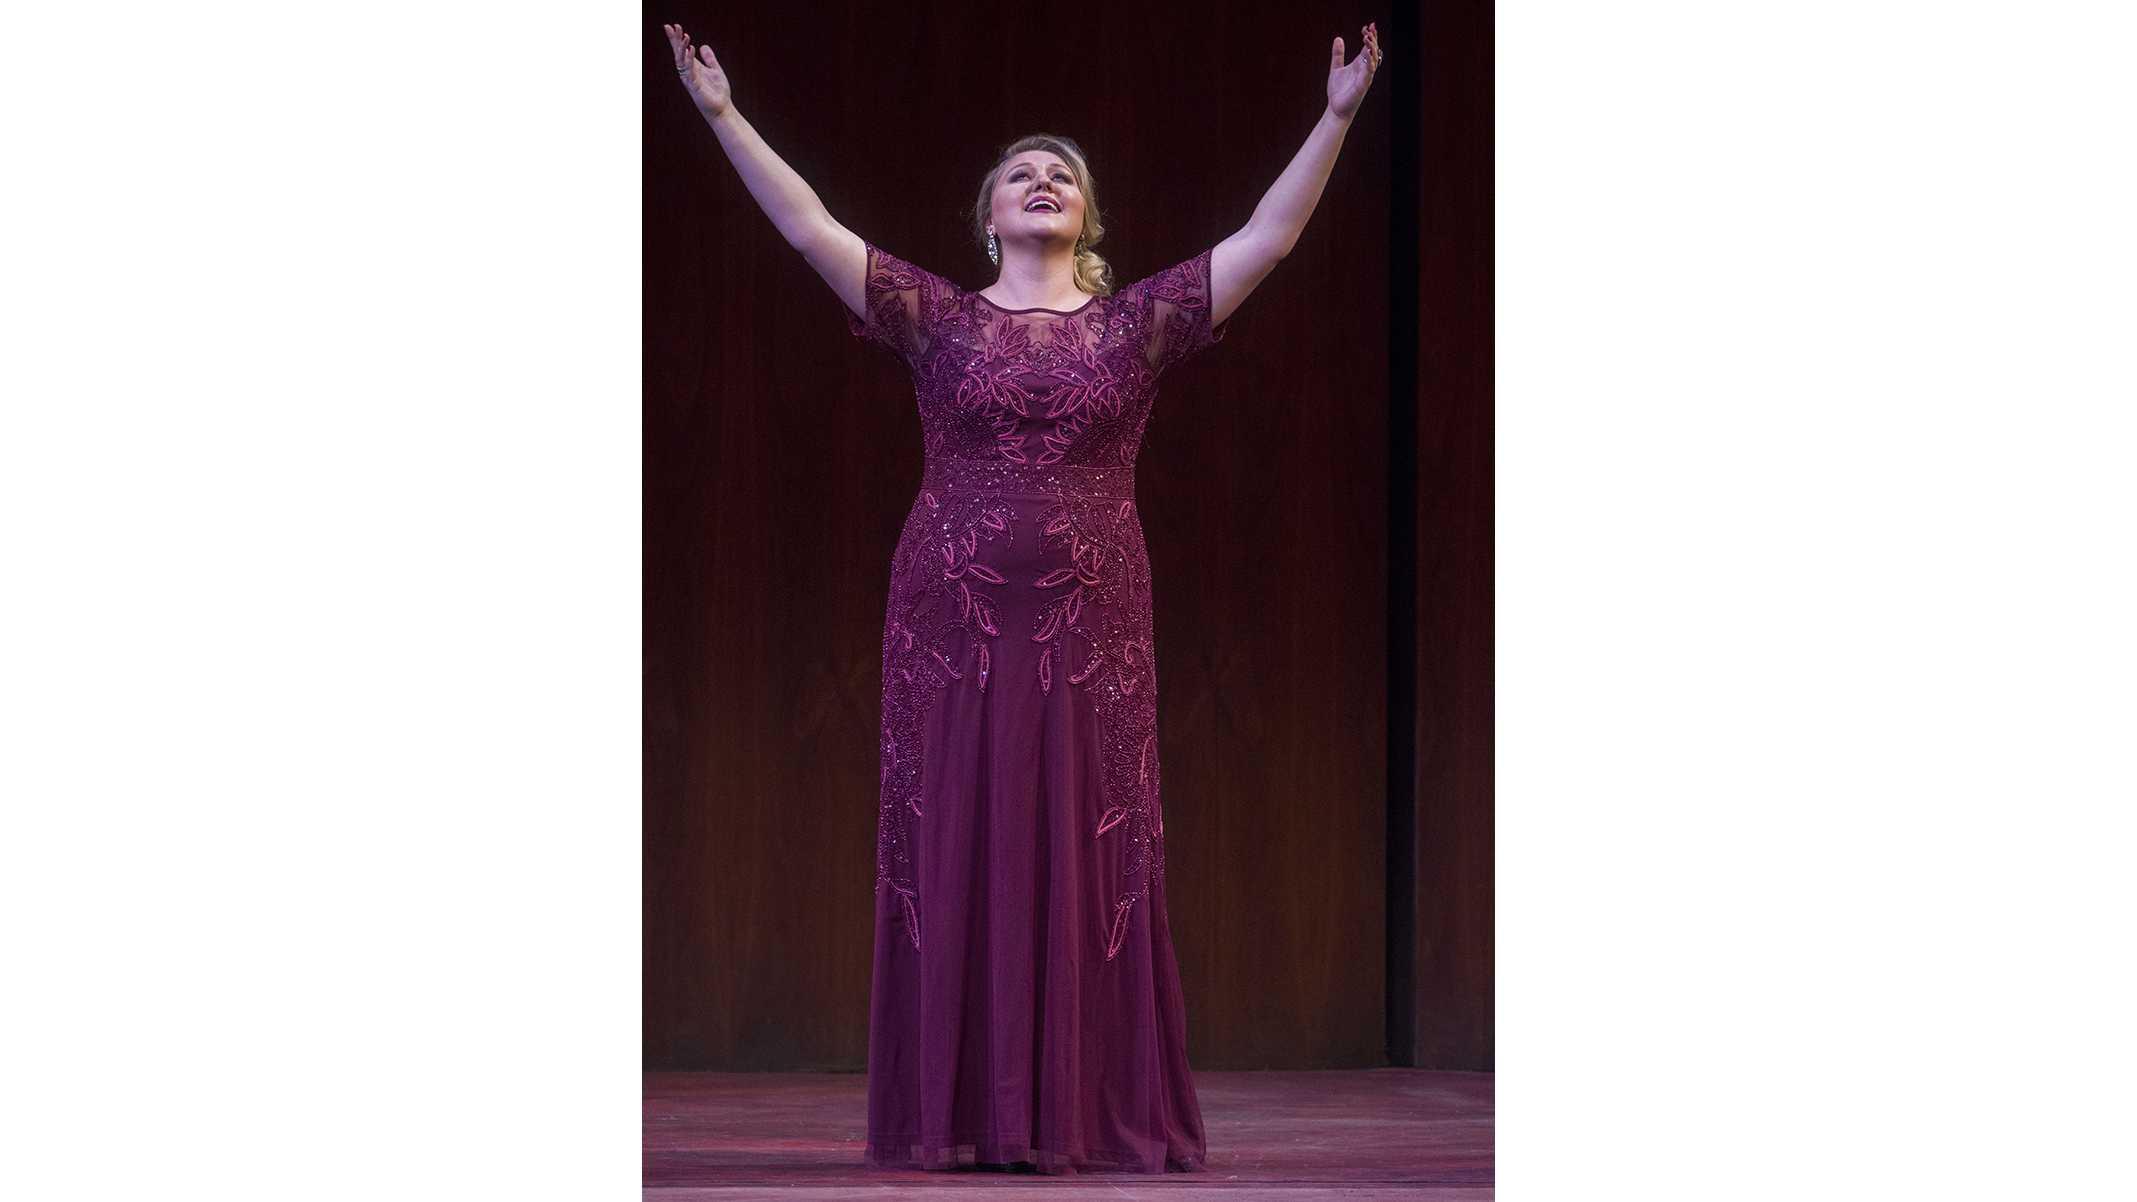 Iowa City born Jessica Faselt wins opera award